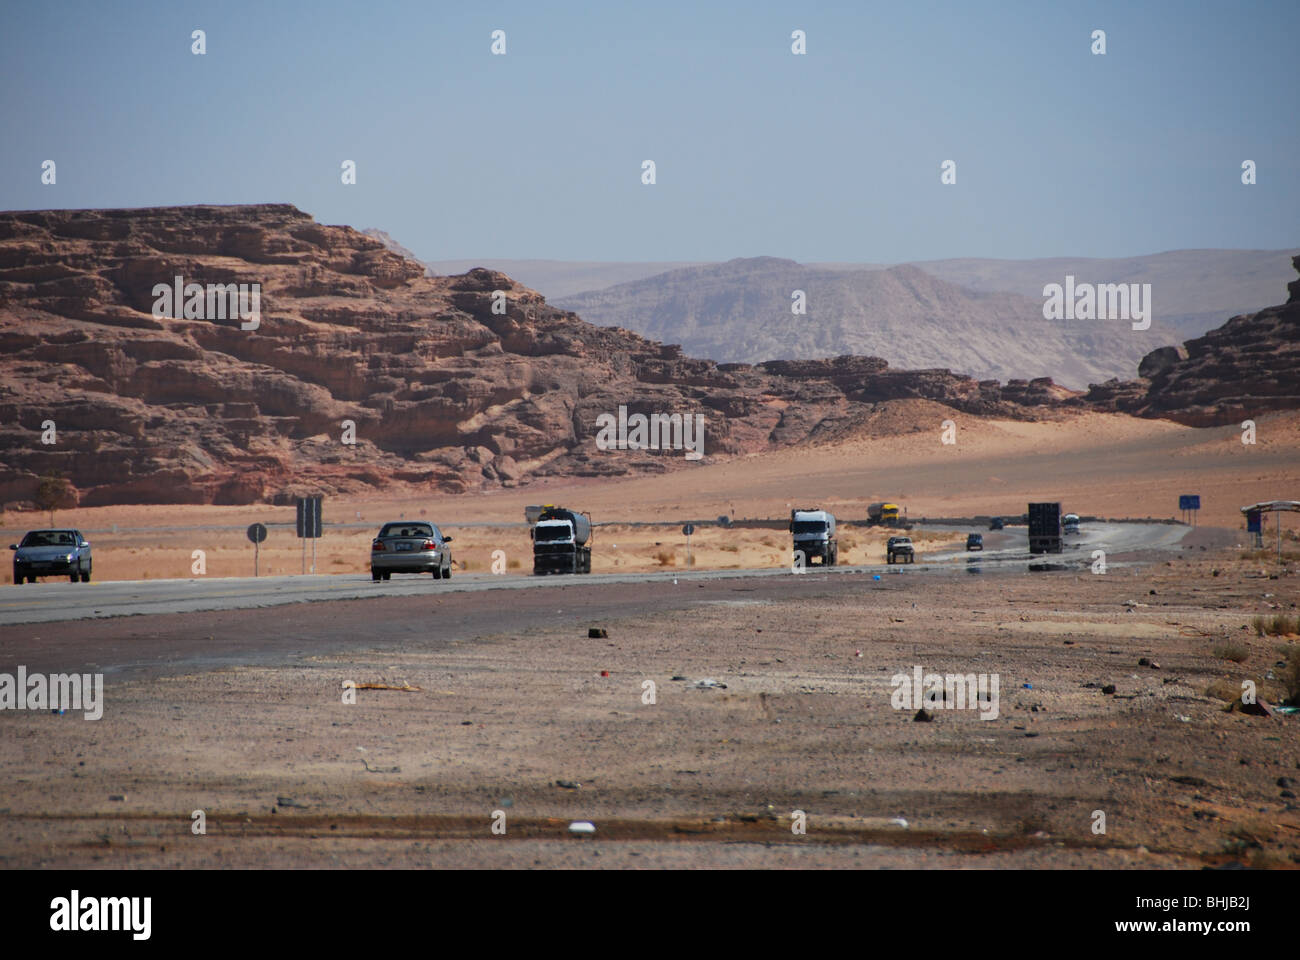 Traffic on desert road from Aqaba to Petra, Jordan - Stock Image